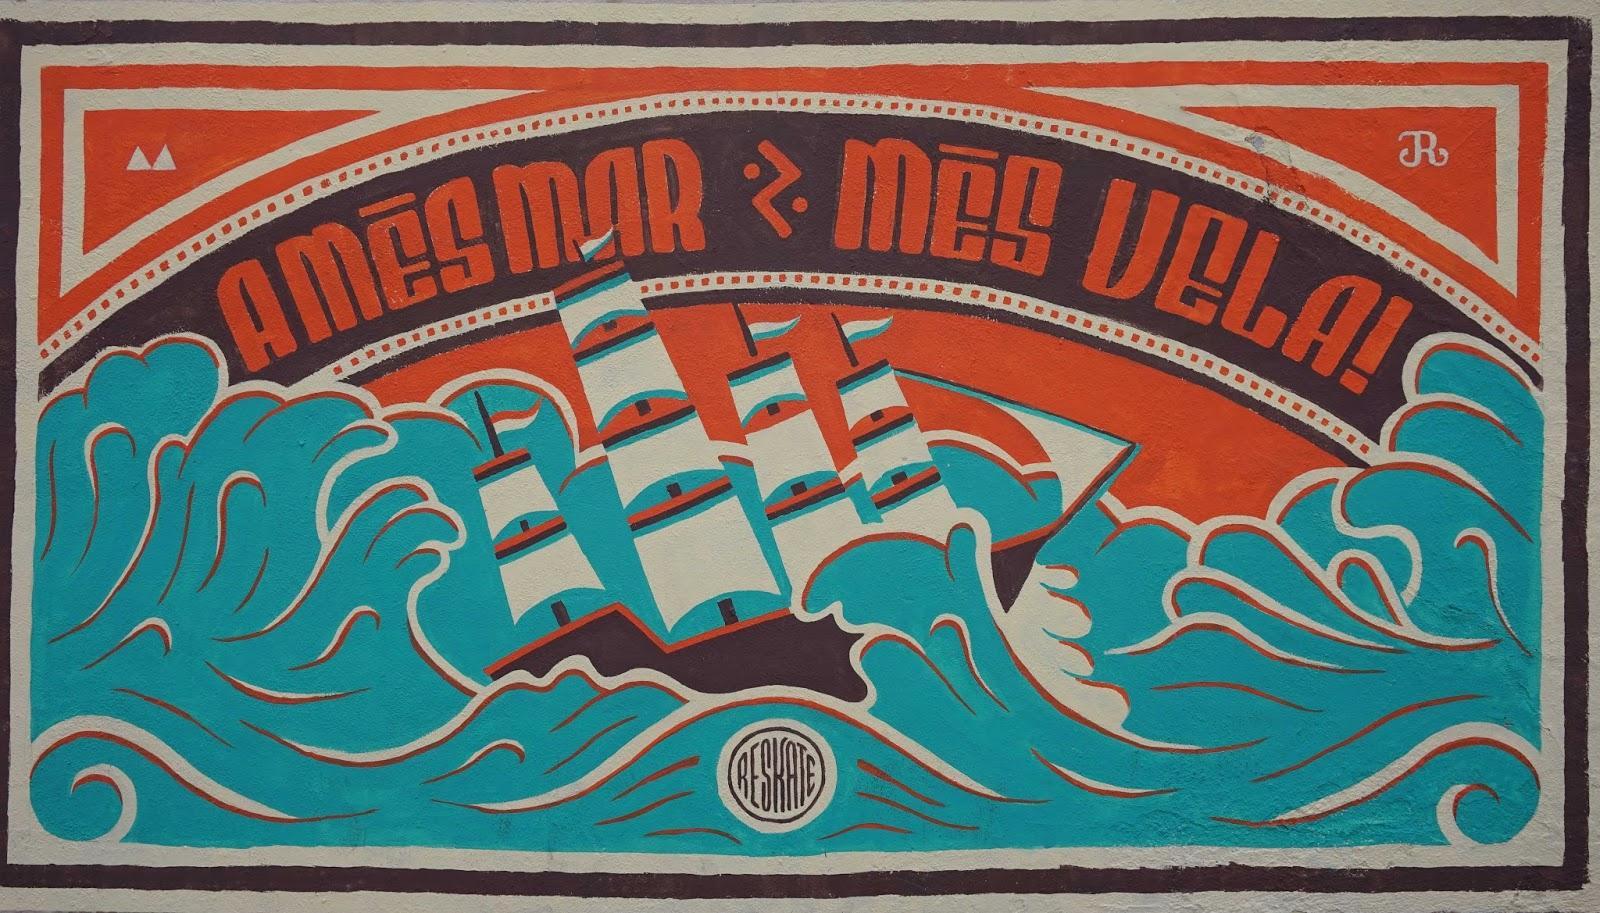 Barcelona Street Art - More sea means more sailing!